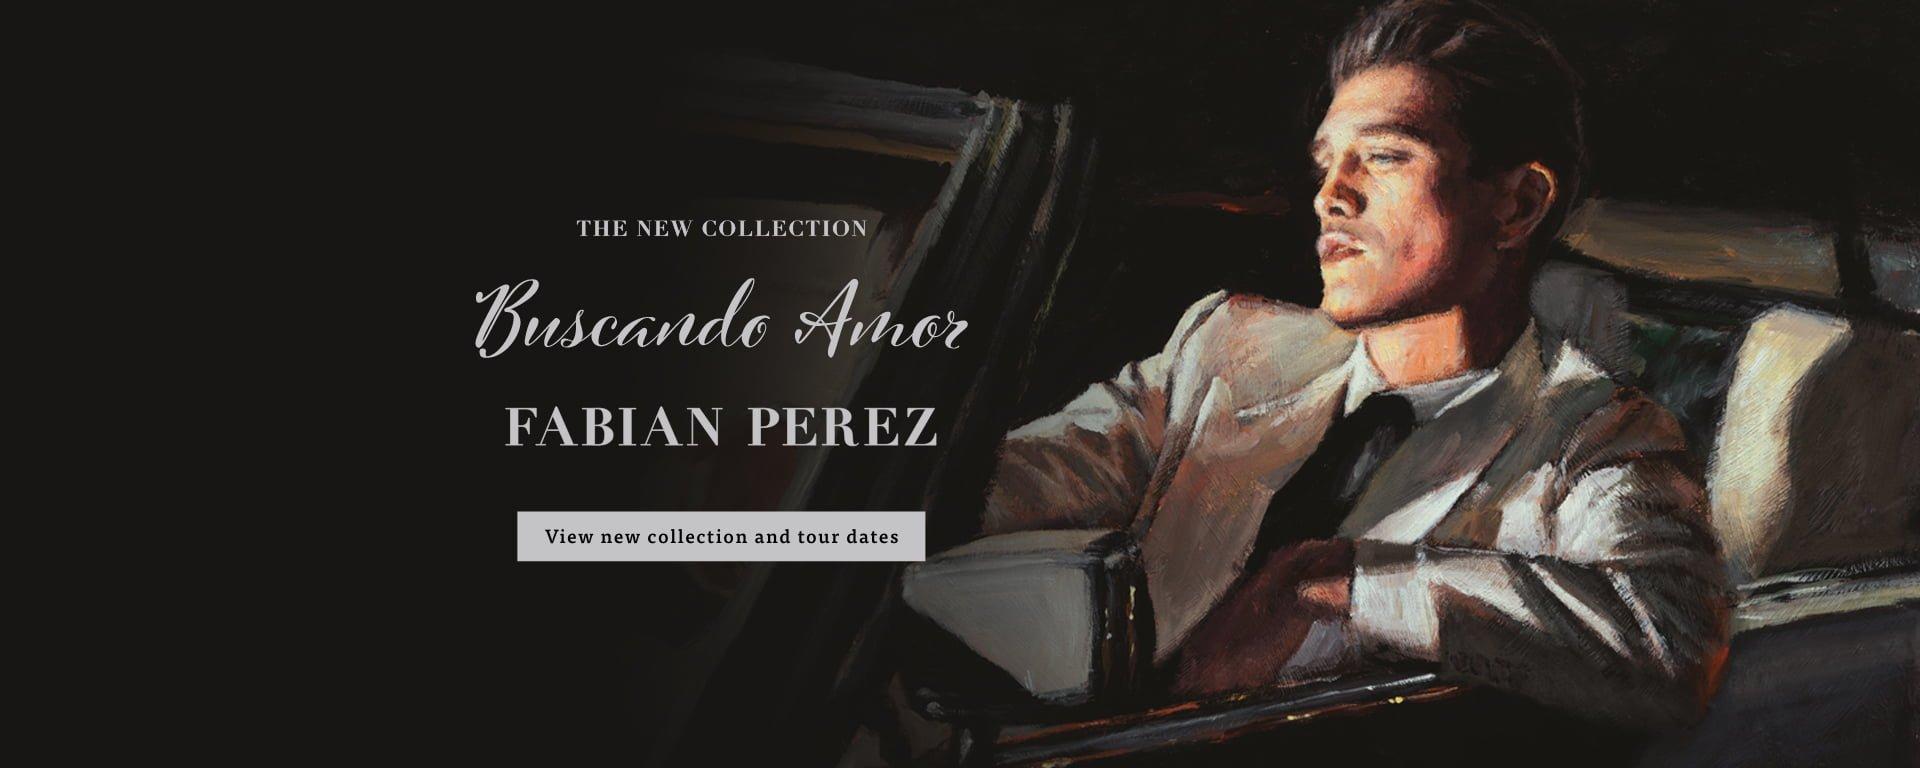 Fabian Perez | Buscando Amor